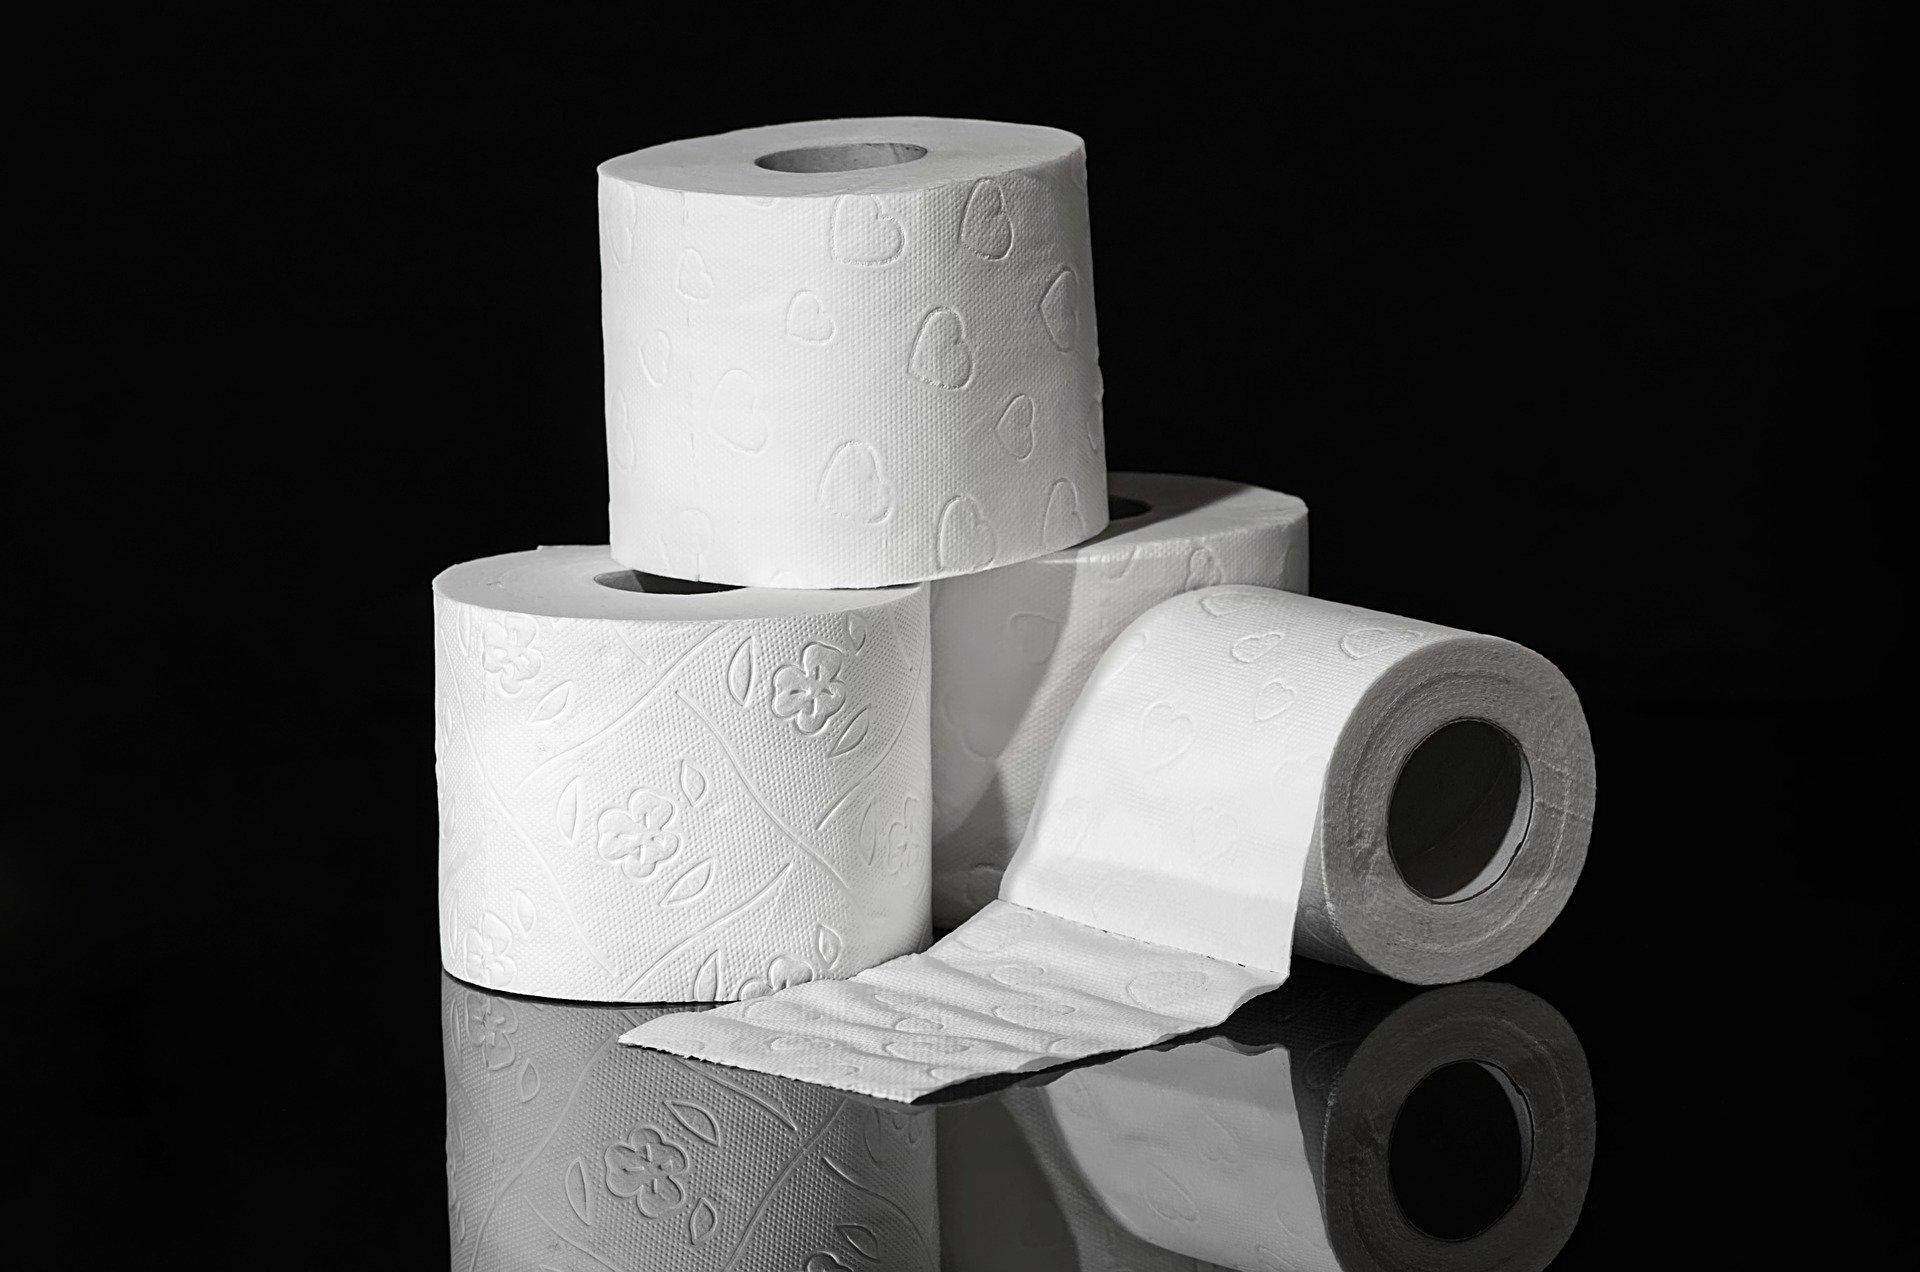 туалетная бумага, коронавирус, COVID-19